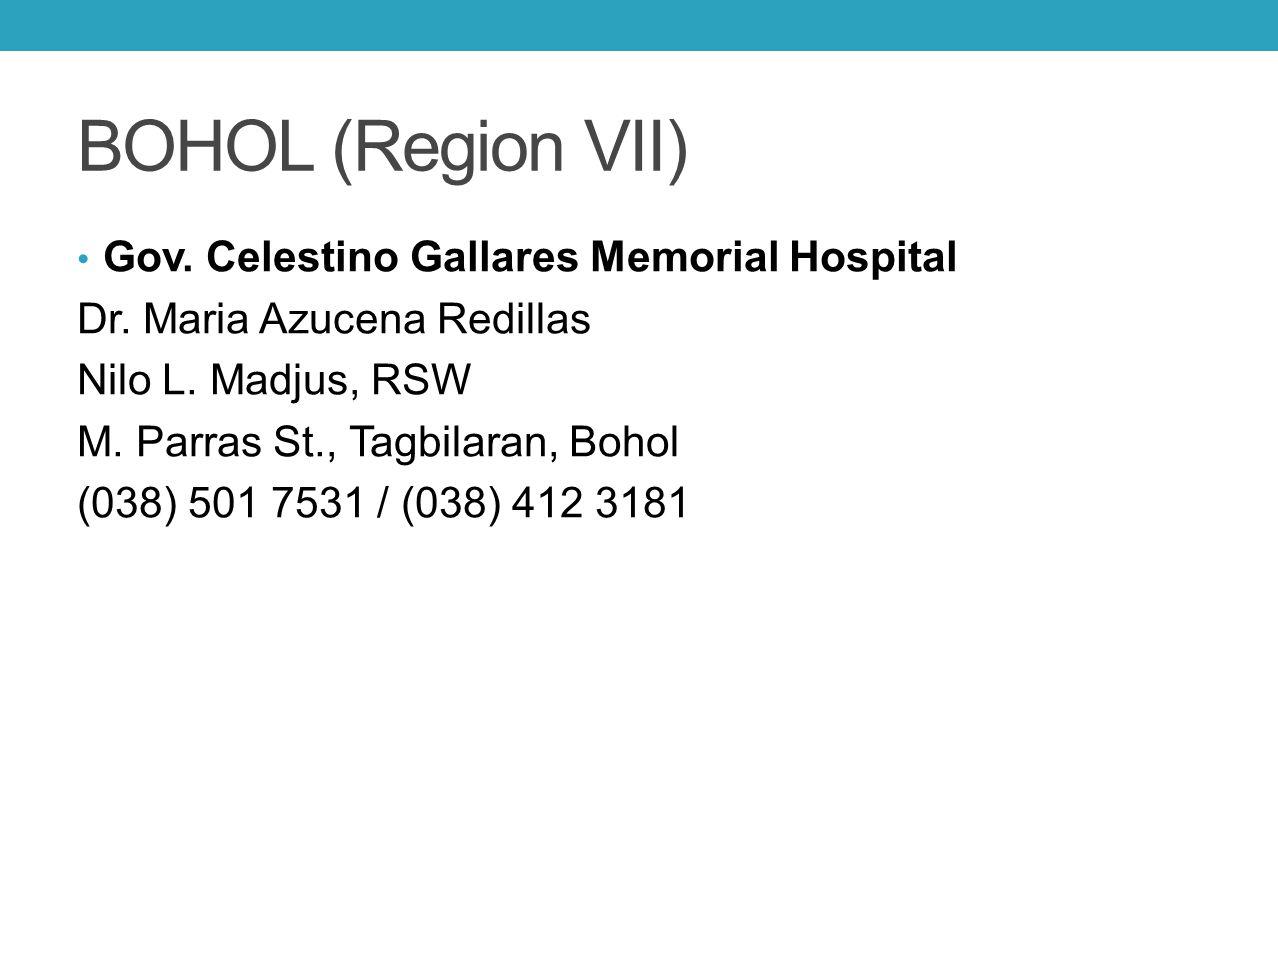 BOHOL (Region VII) Gov. Celestino Gallares Memorial Hospital Dr. Maria Azucena Redillas Nilo L. Madjus, RSW M. Parras St., Tagbilaran, Bohol (038) 501